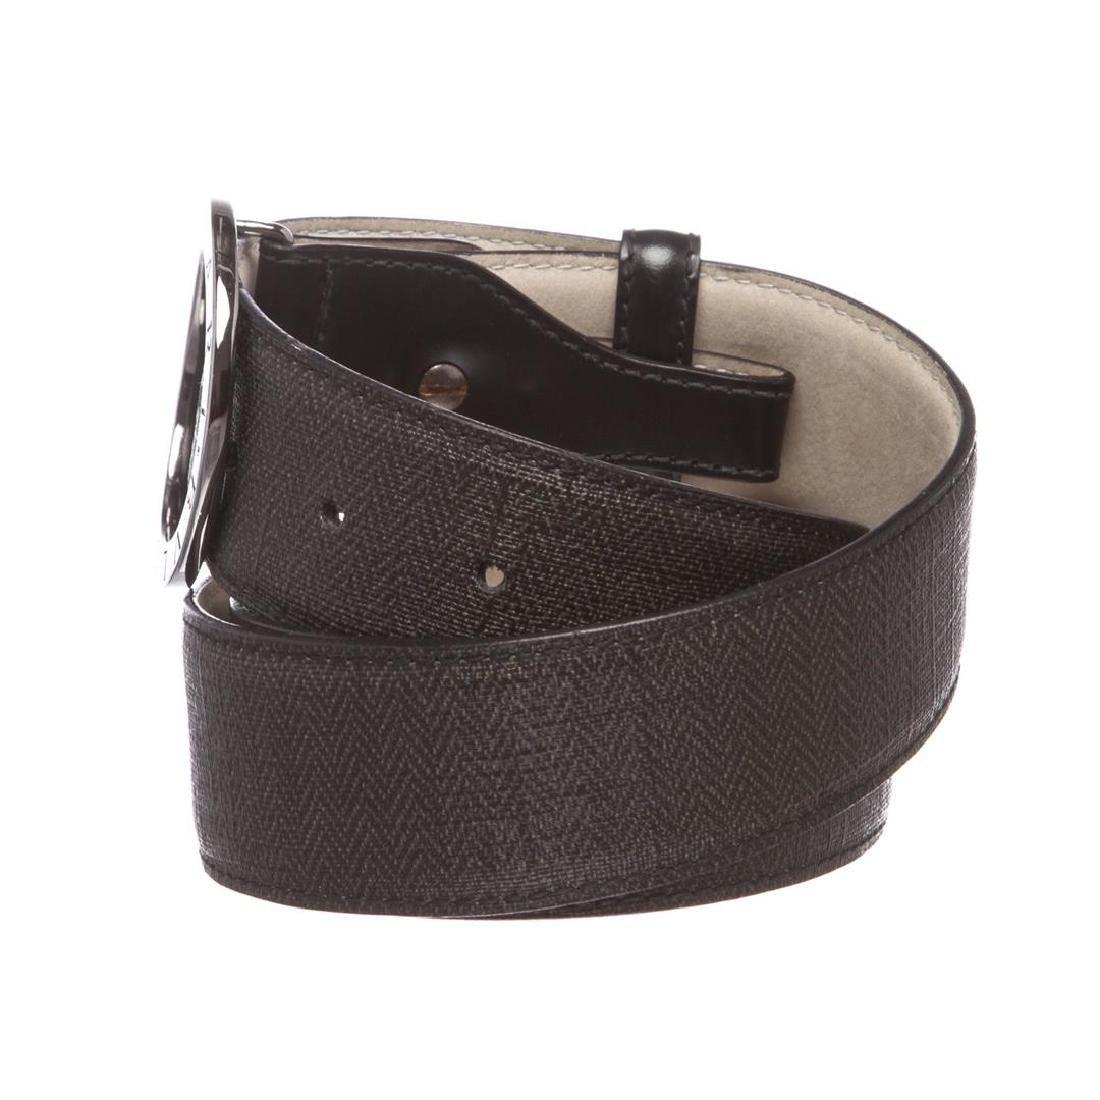 Bvlgari Black Gray Coated Canvas Leather Belt - 4